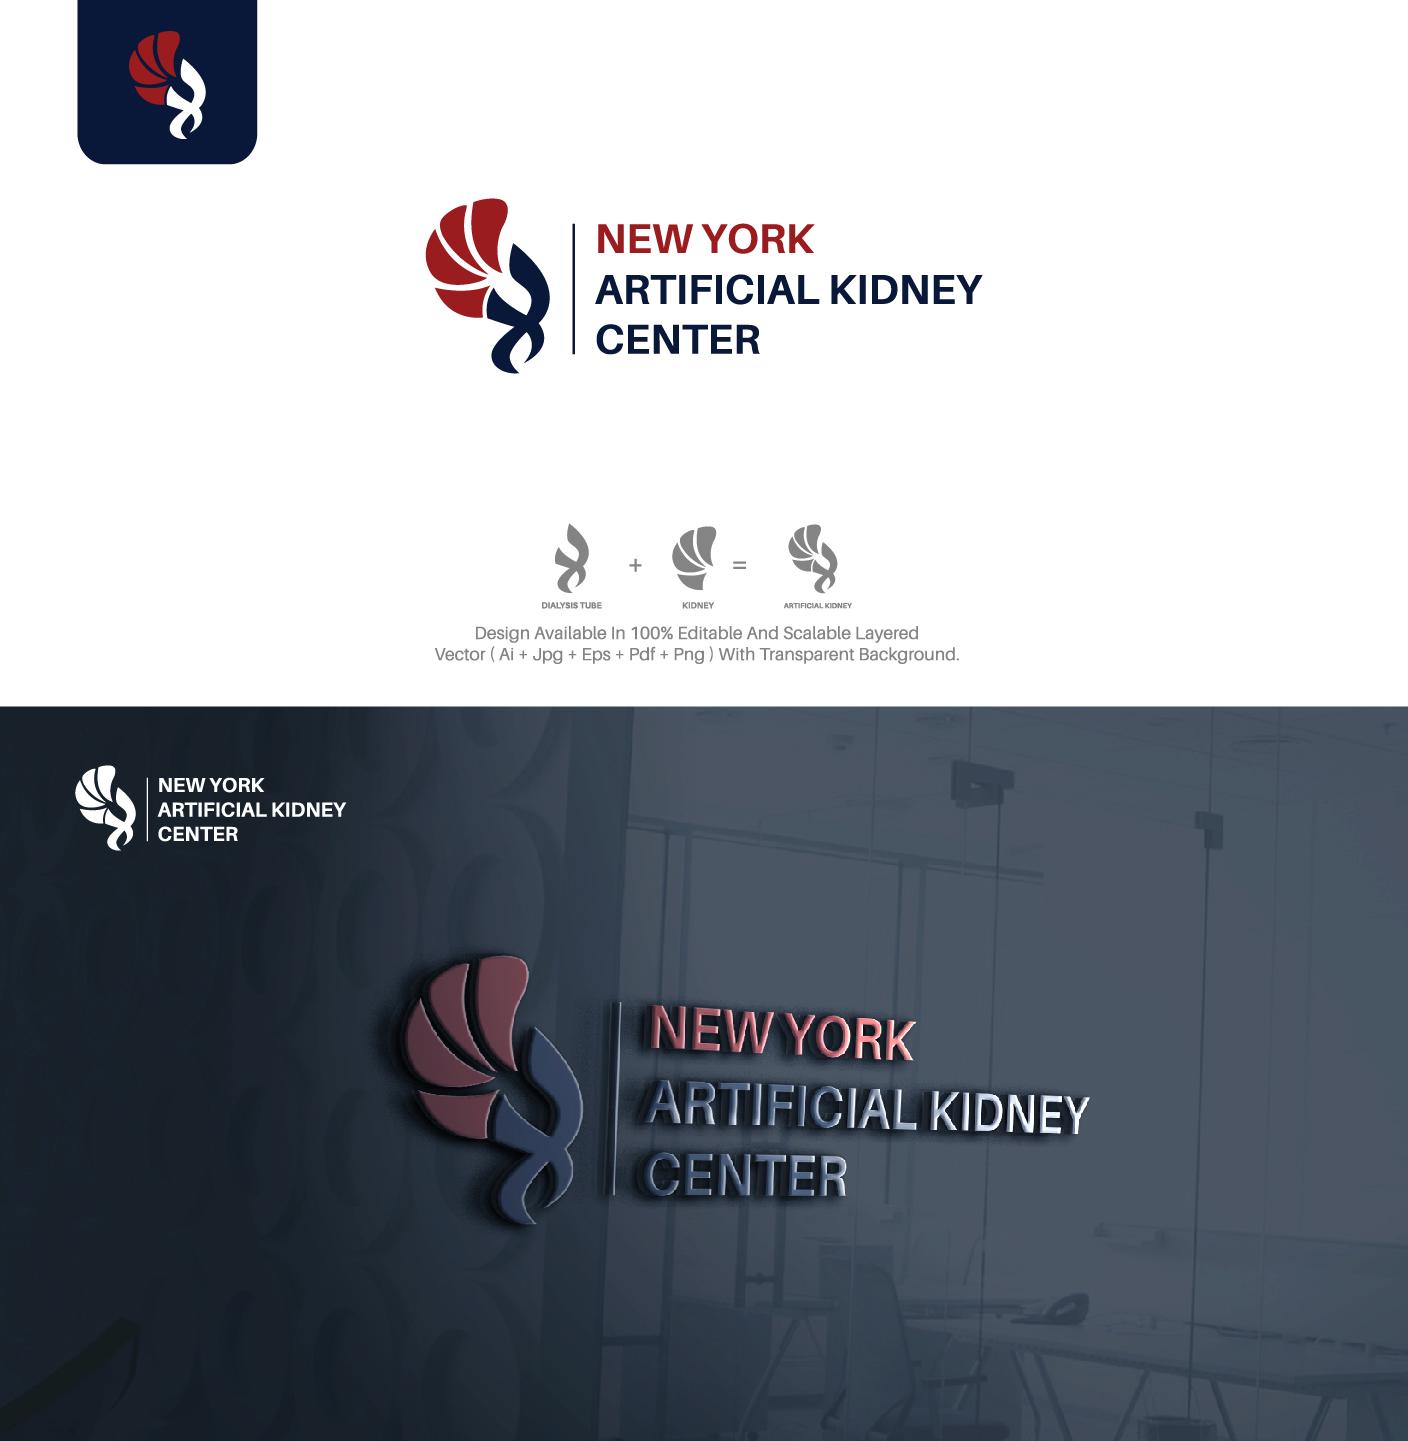 Serious, Professional, Medical Logo Design for New York Artificial